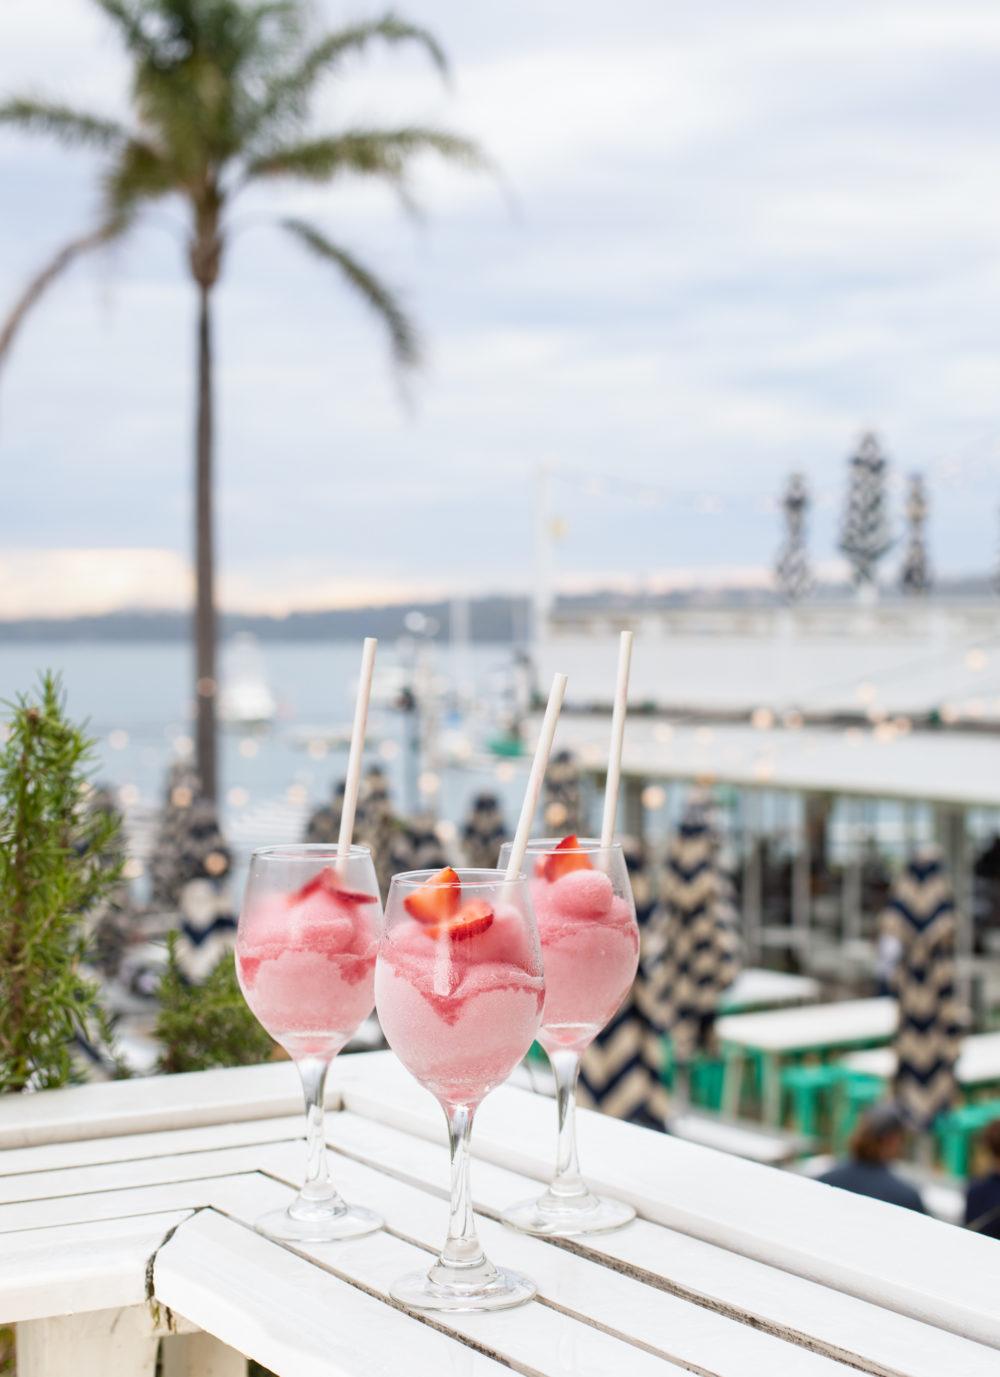 3 Pink Frozen Cocktails overlooking the beach